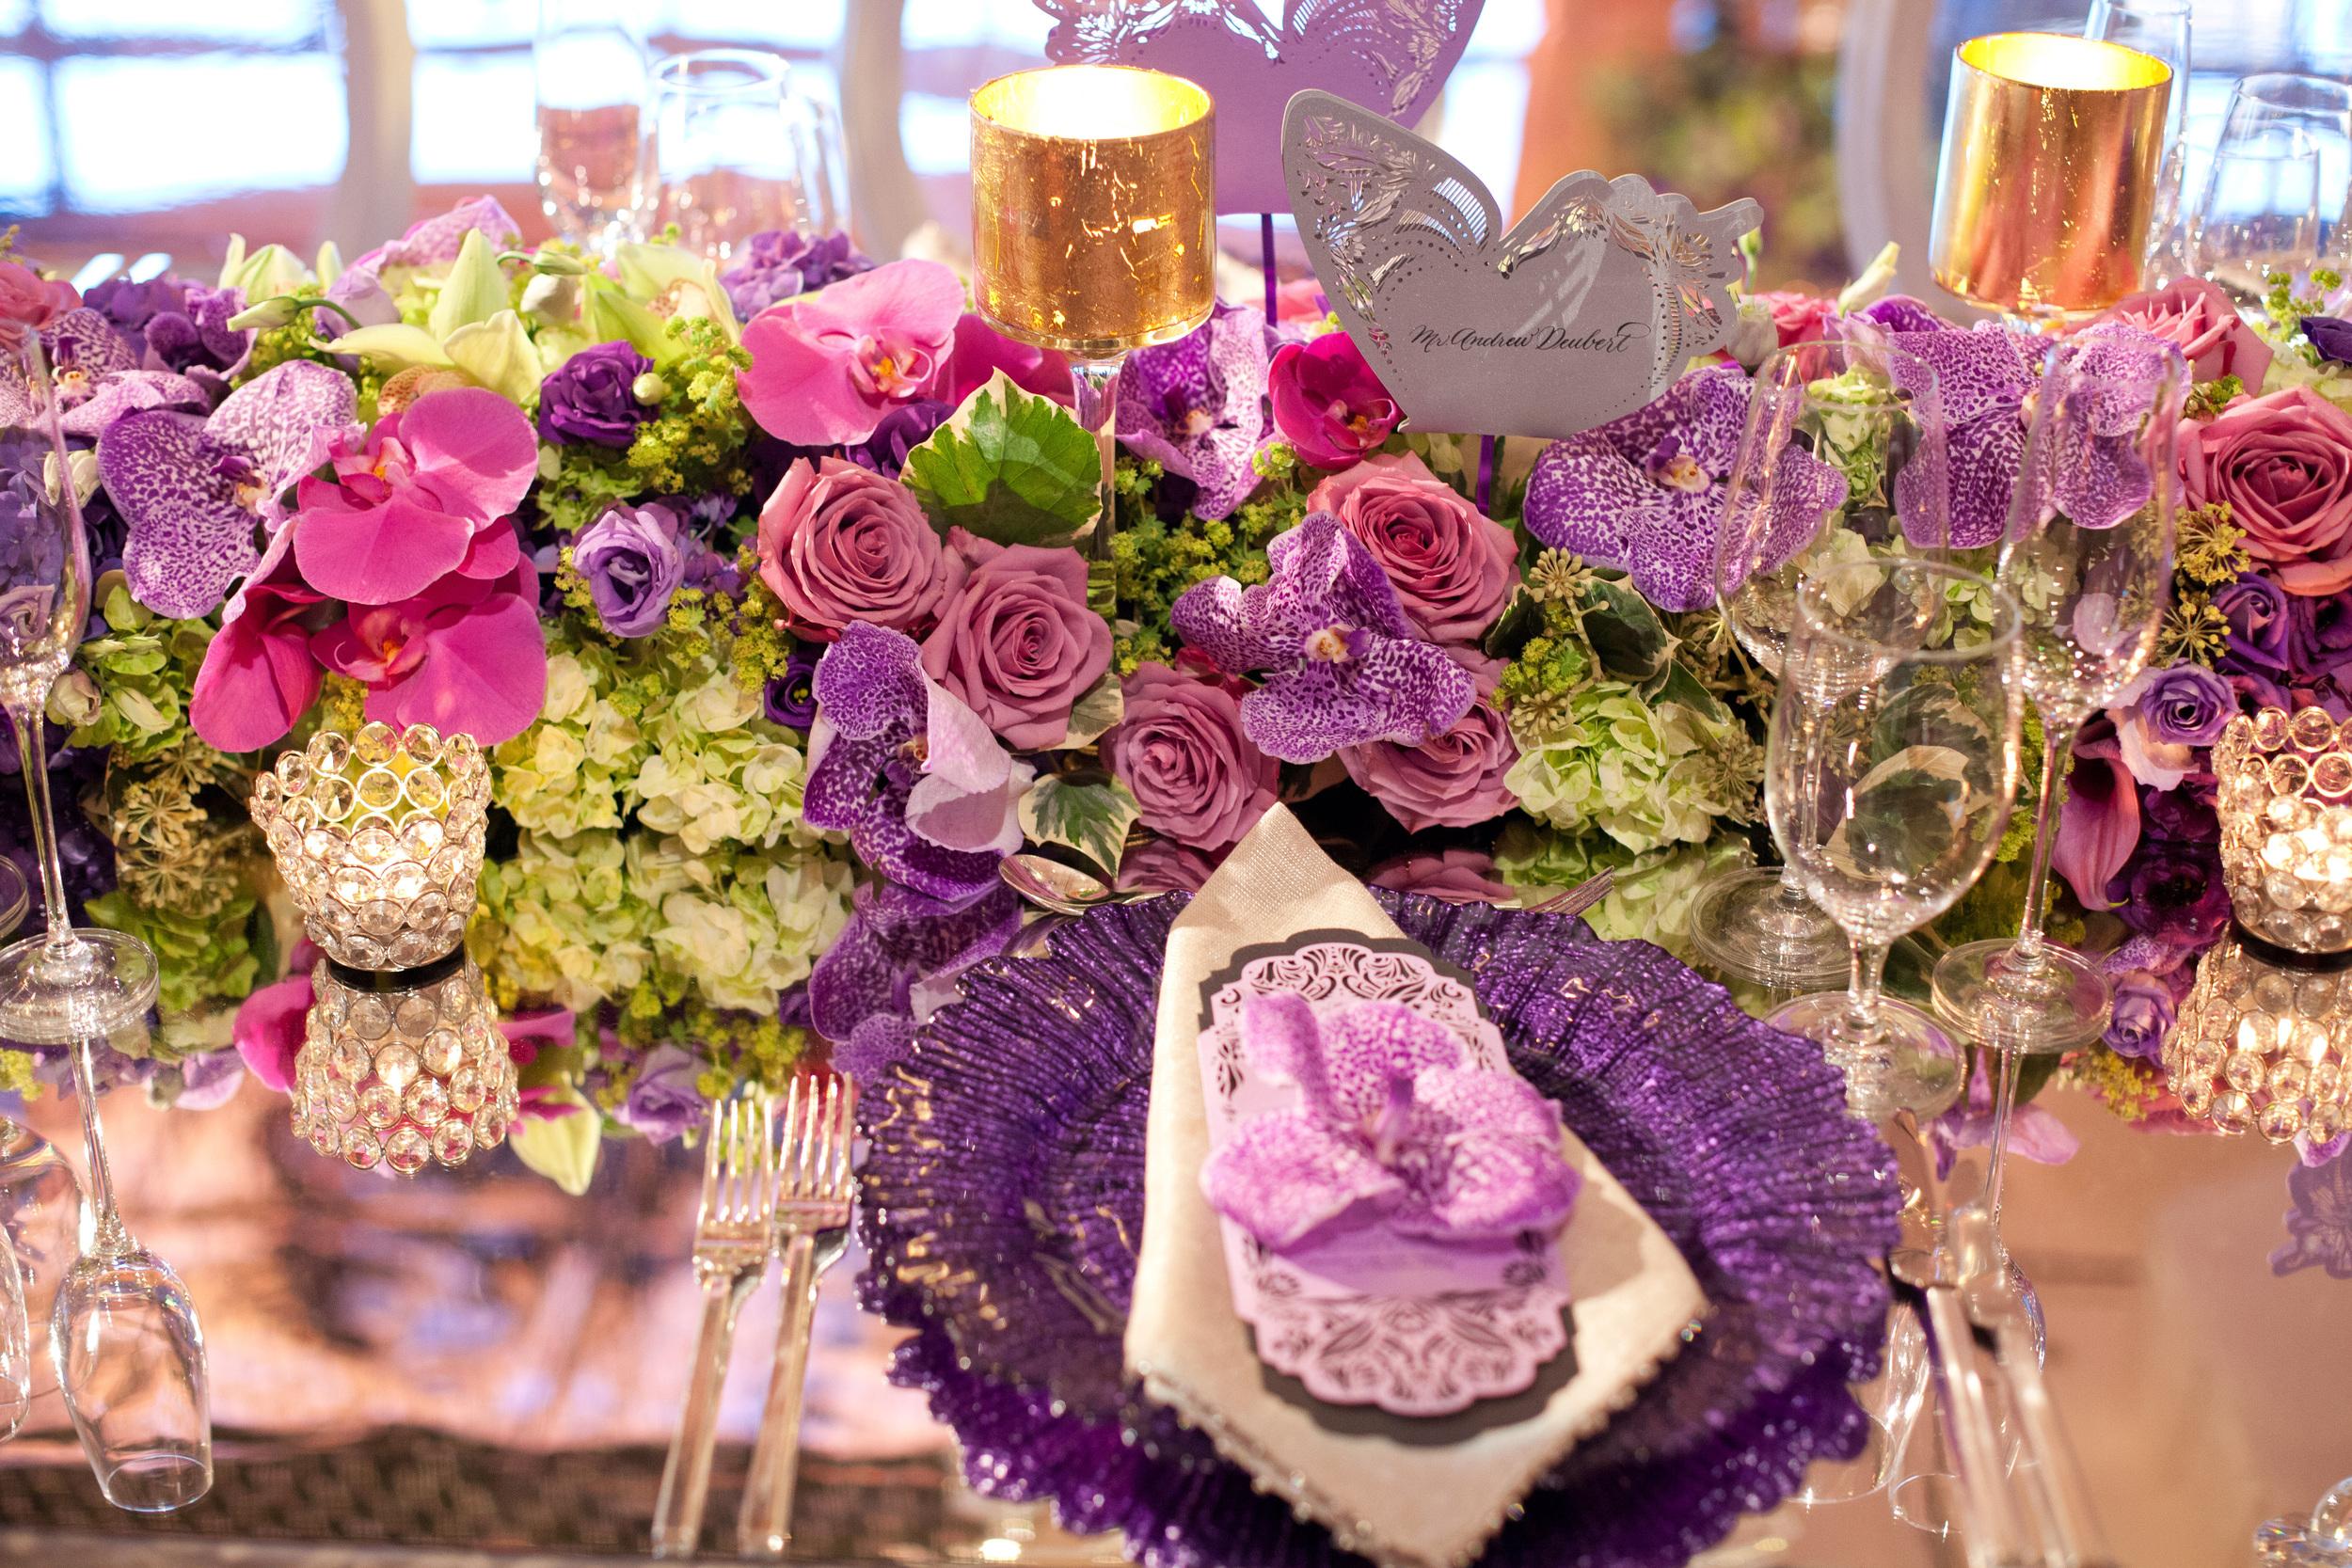 mandarin_oriental_new_york_city_branding_inspiration_lavender_silver_wedding_floral_purple_v284_29.jpg